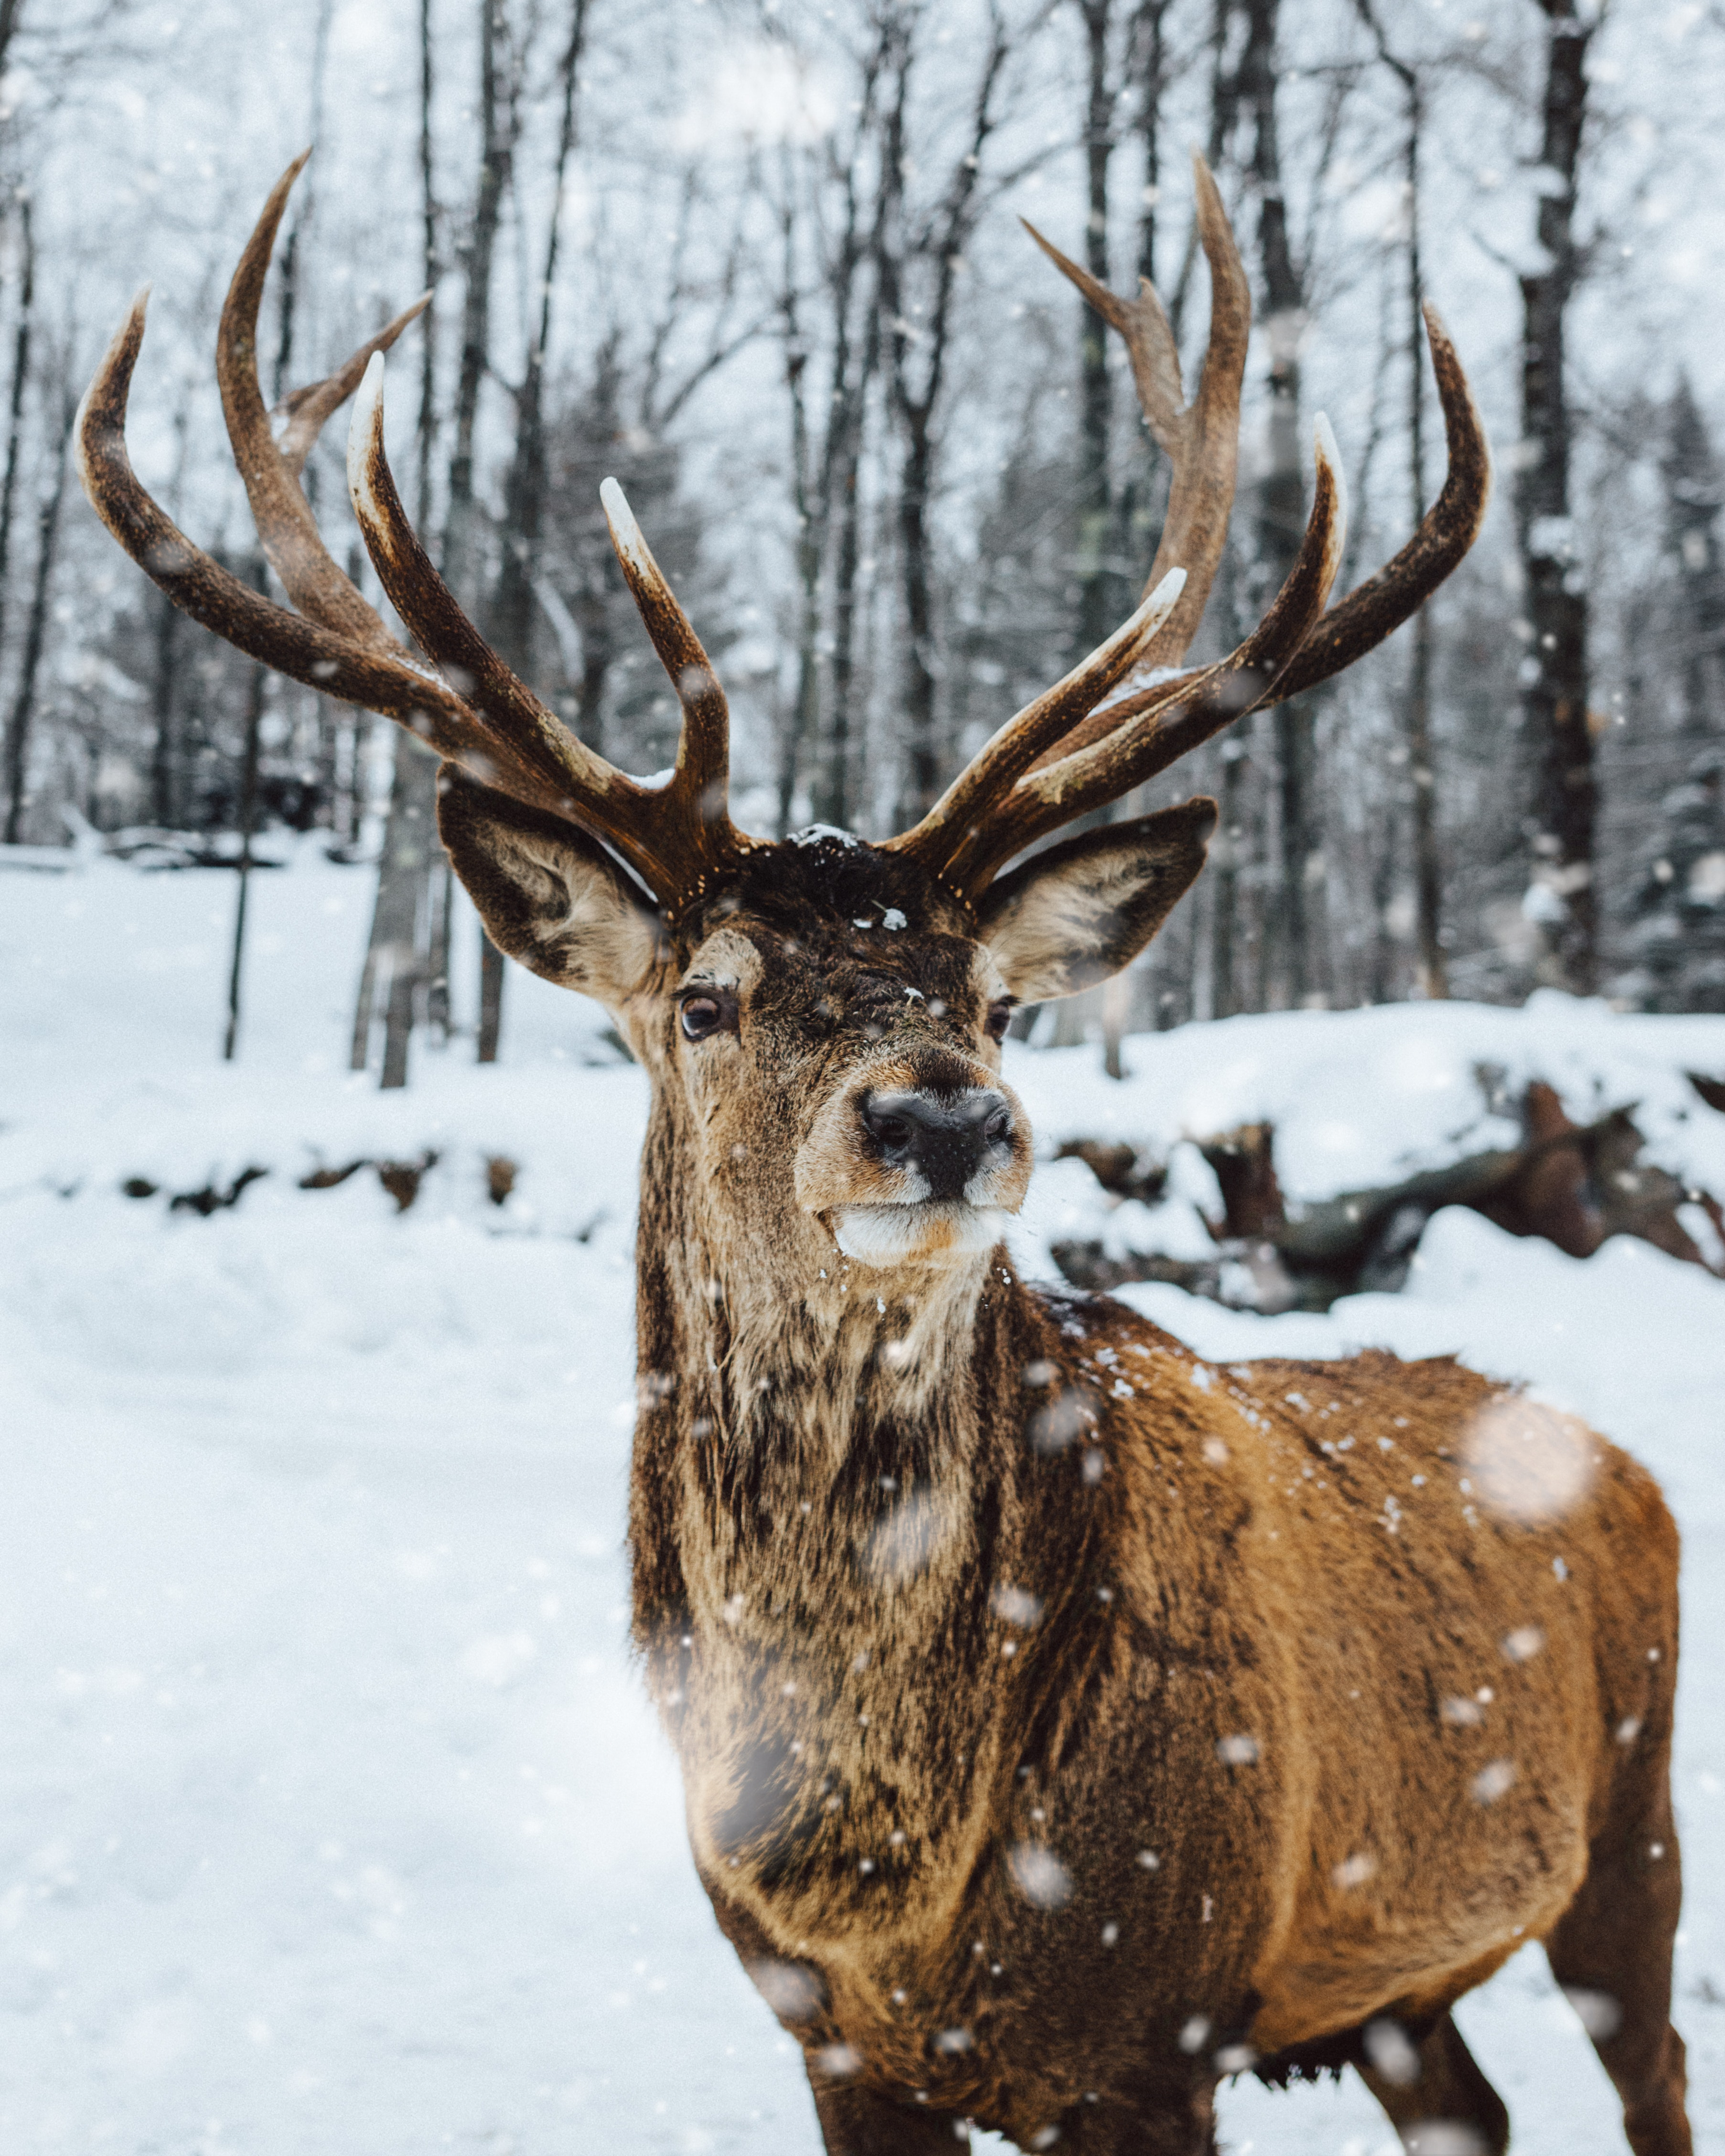 Photo Of Deer On Snow by Louis